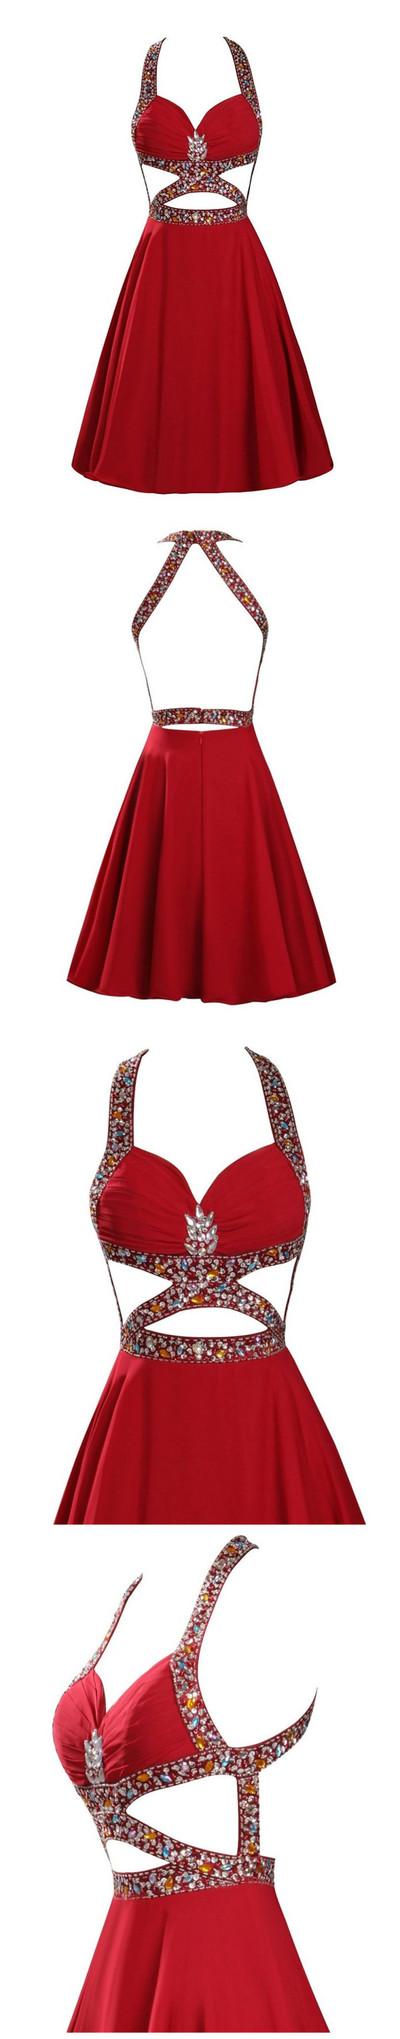 Vestidos Graduacion  Largo Sexy Backless Red Chiffon Beaded Sweet 16 Dresses Short Homecoming Dresses